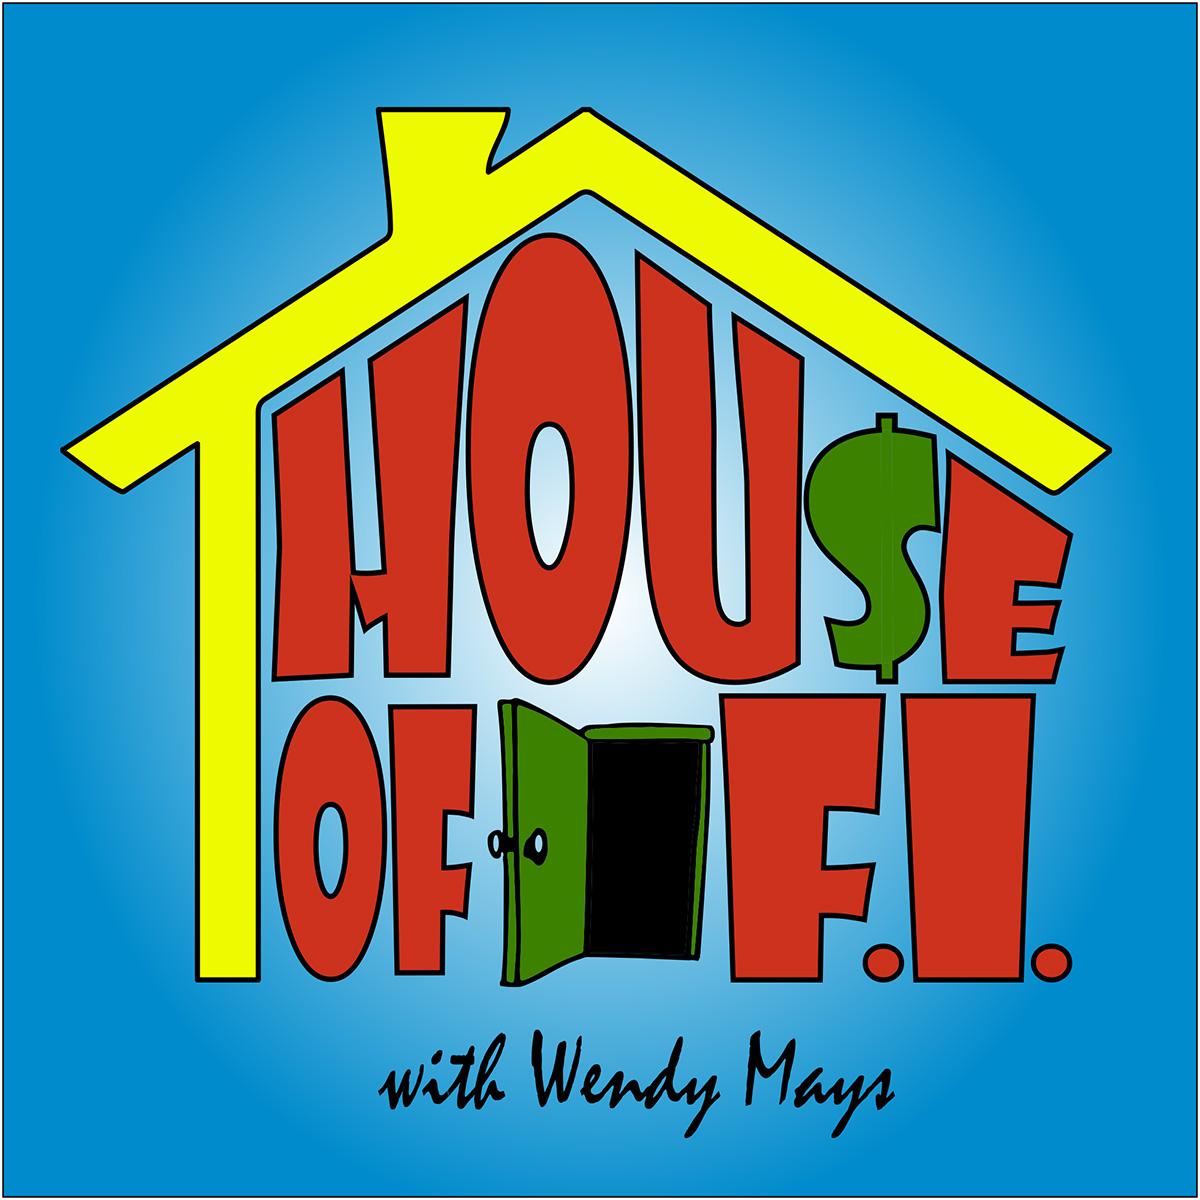 House of FI show art